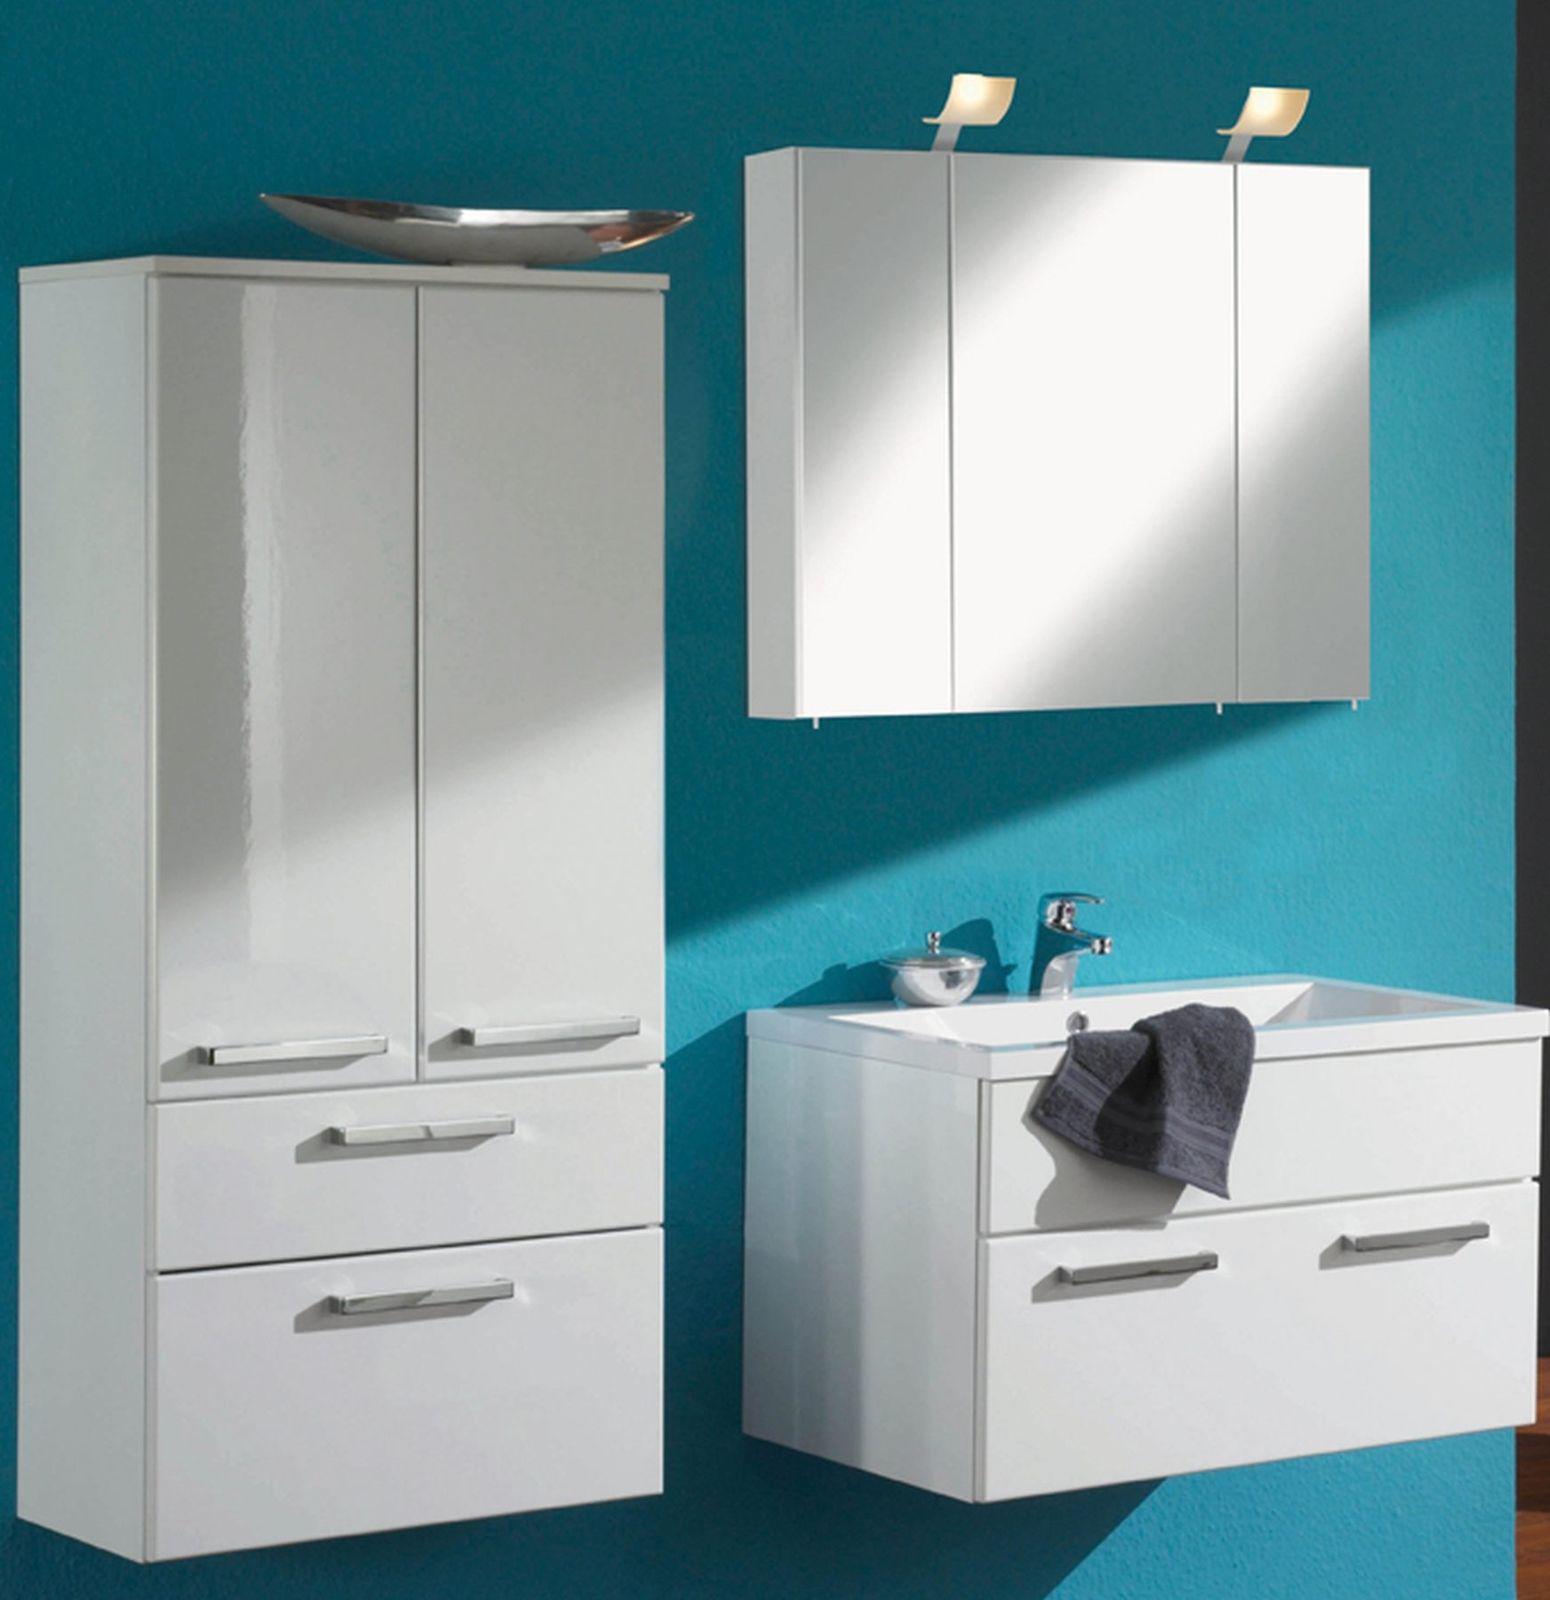 Waschplatz Komplett Set Waschplatz Badschrank Unterschrank